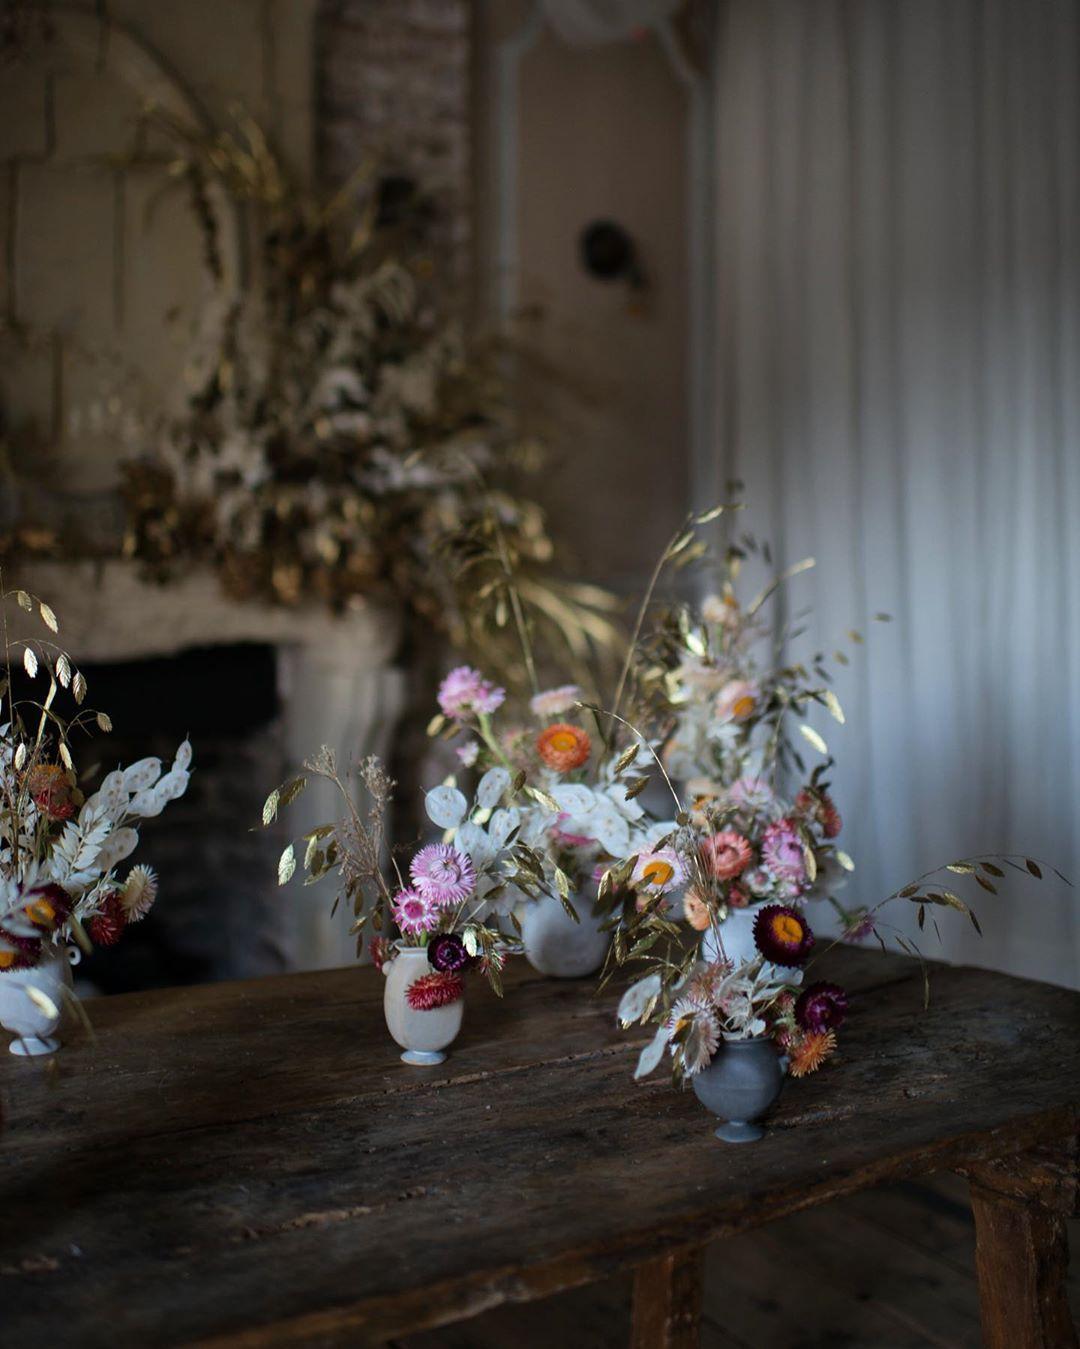 Kitten Grayson Flowers On Instagram Autumn To Gives Way To Winter Genevievelutkin Wedding Decorations Flowers Instagram